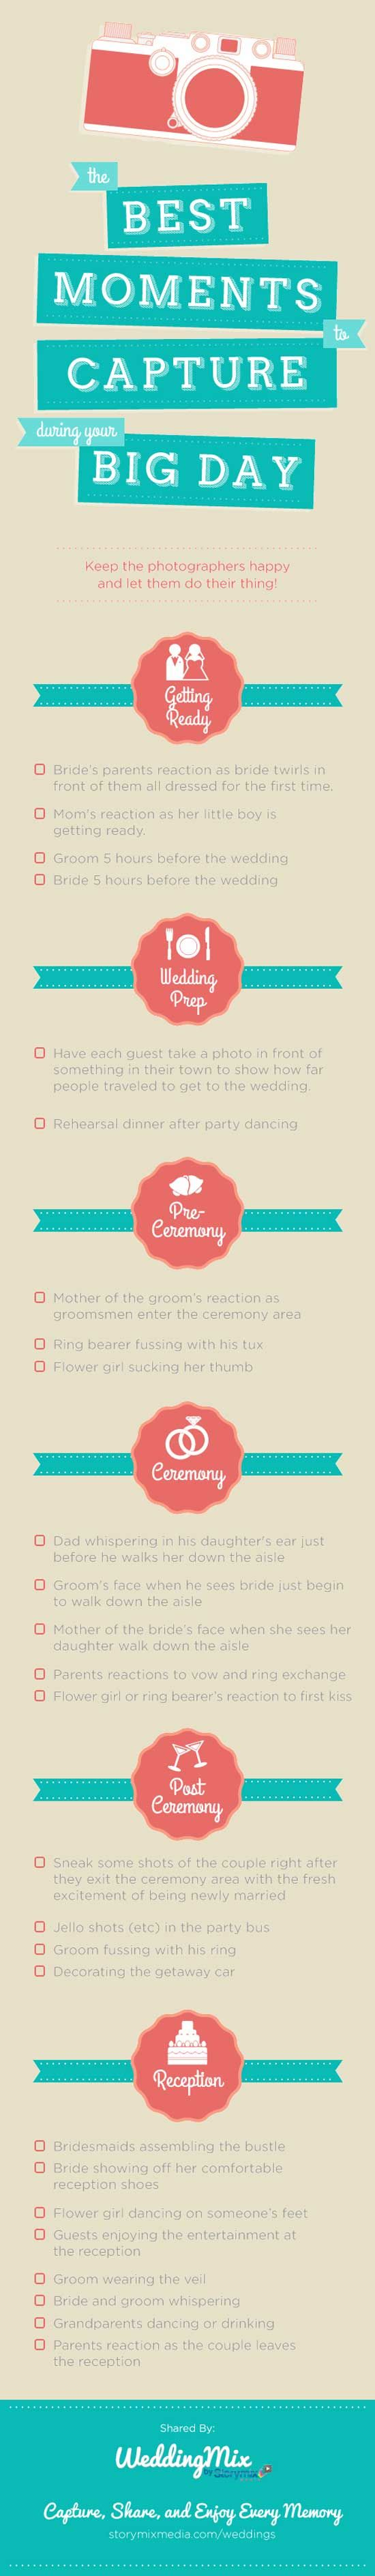 Best 25 Wedding Photography Checklist Ideas On Pinterest